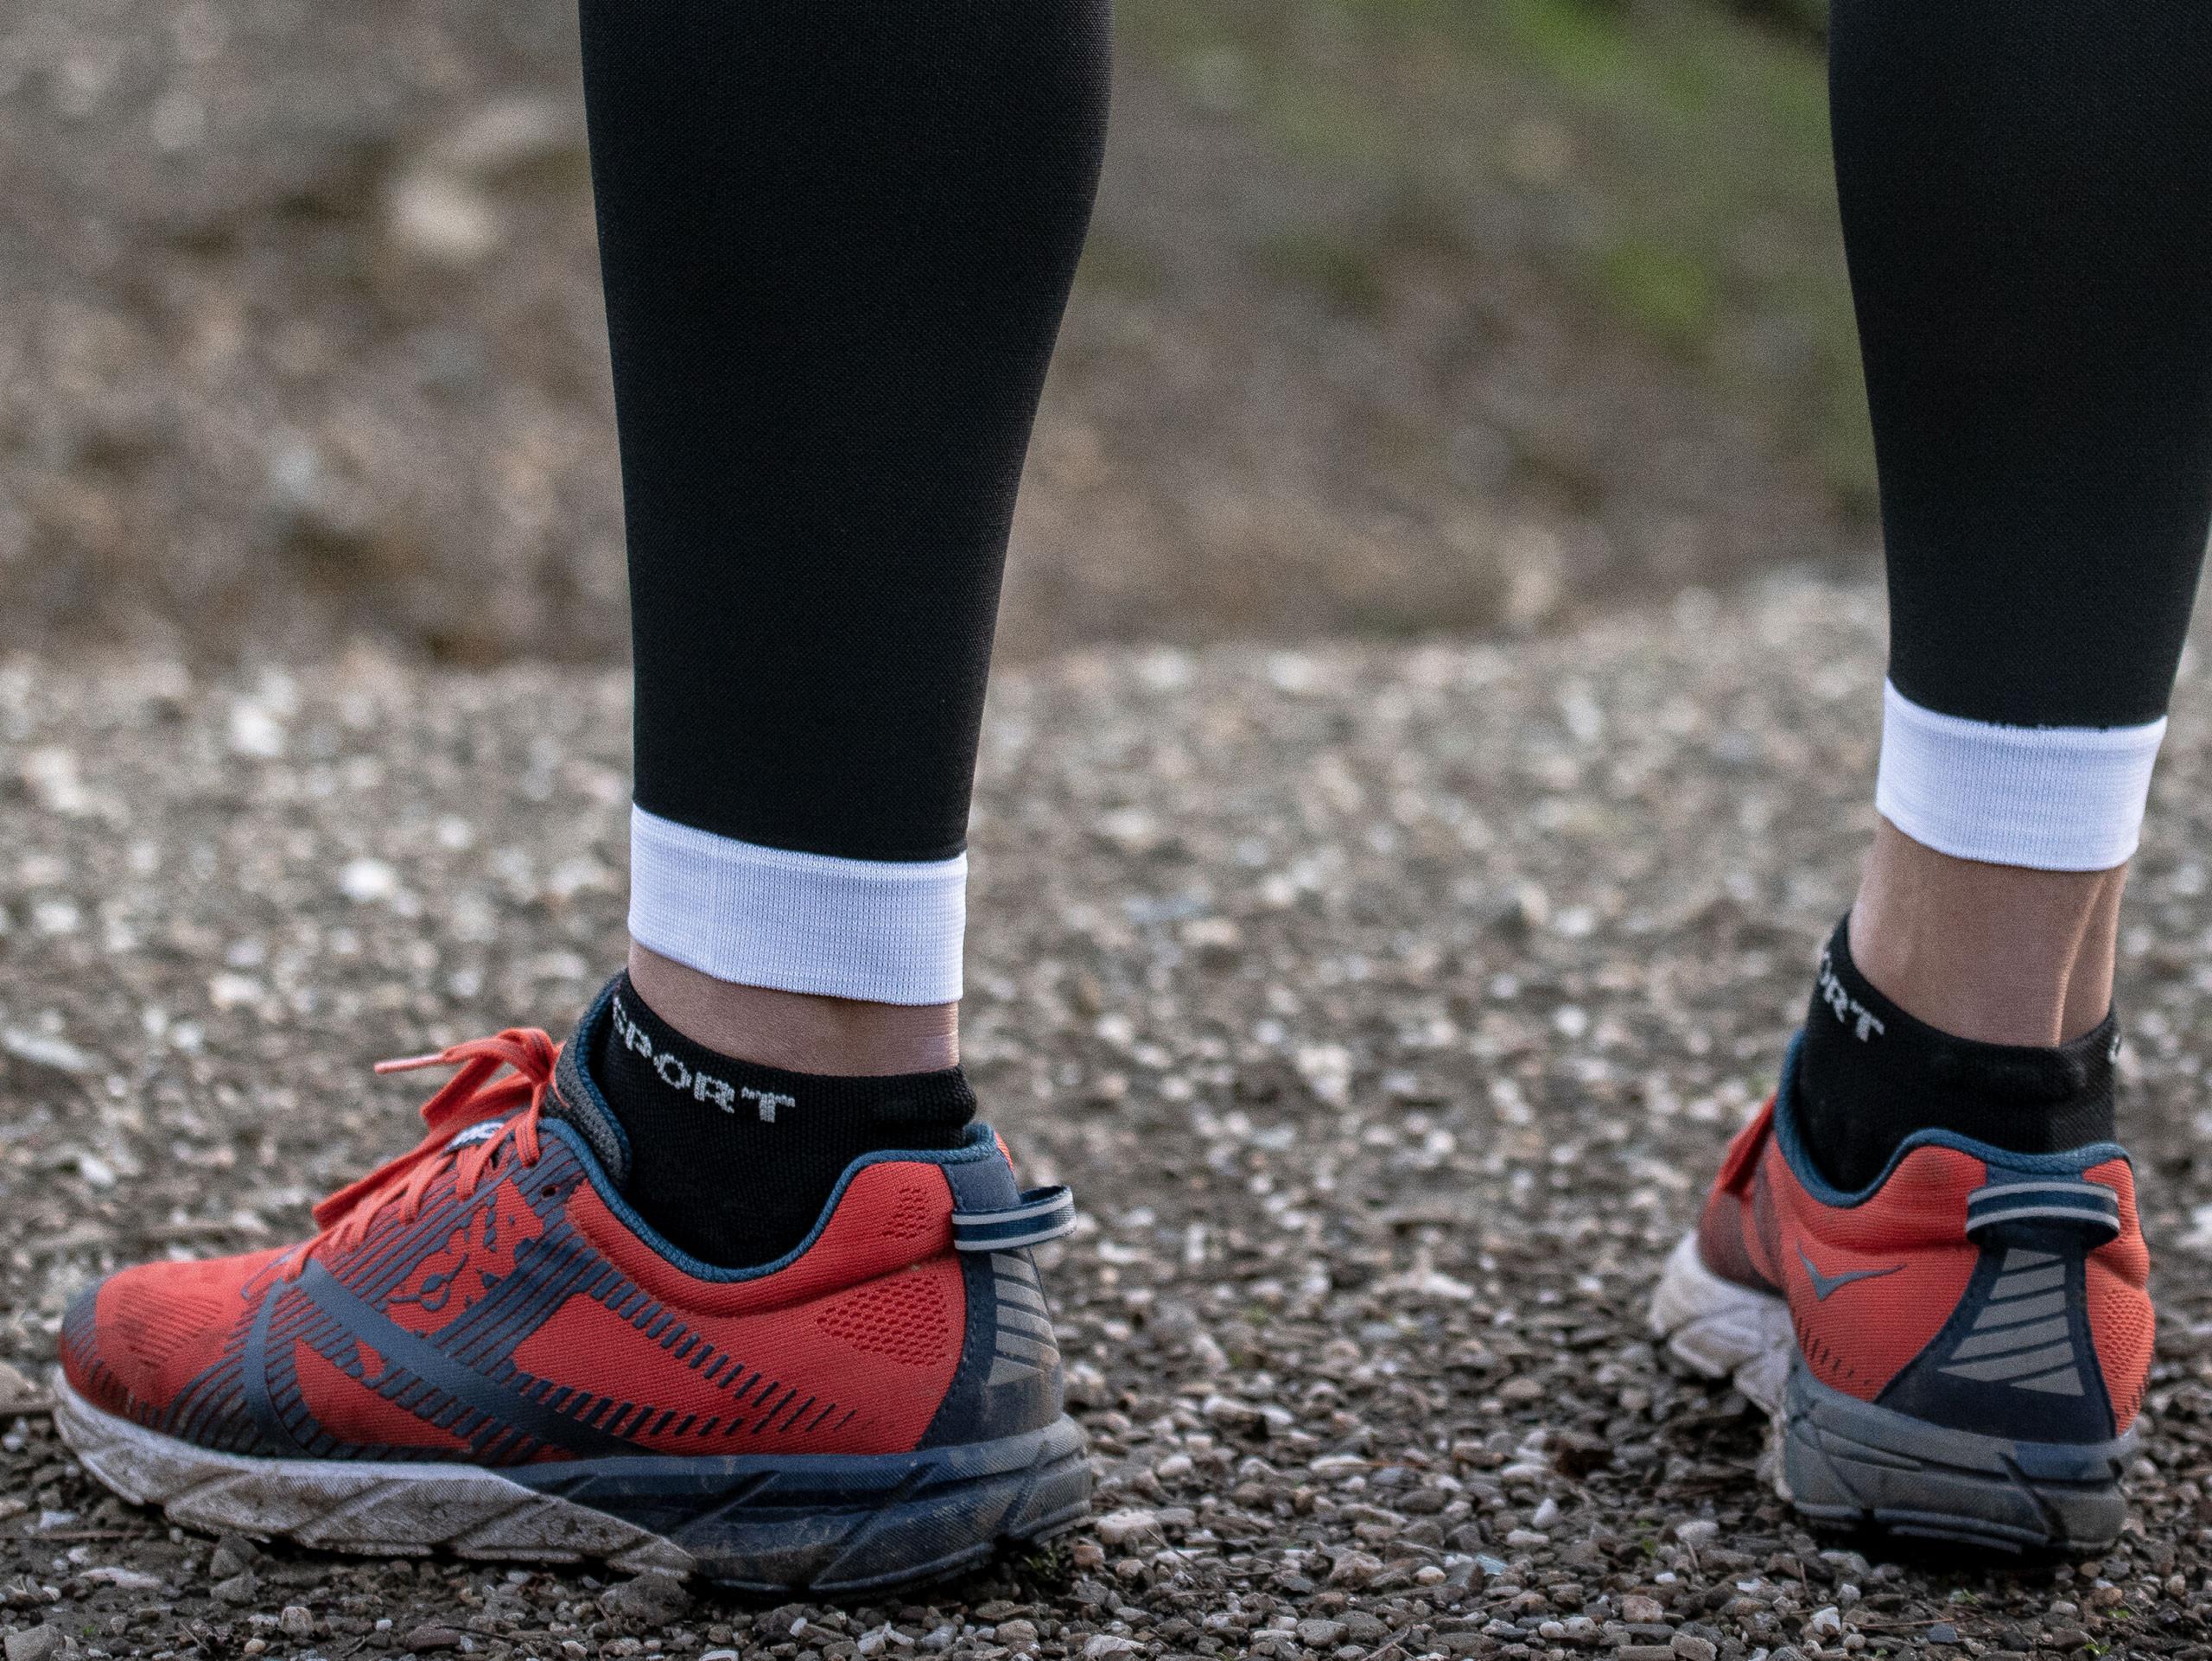 Calcetines deportivos pro v3.0 Run Low negros